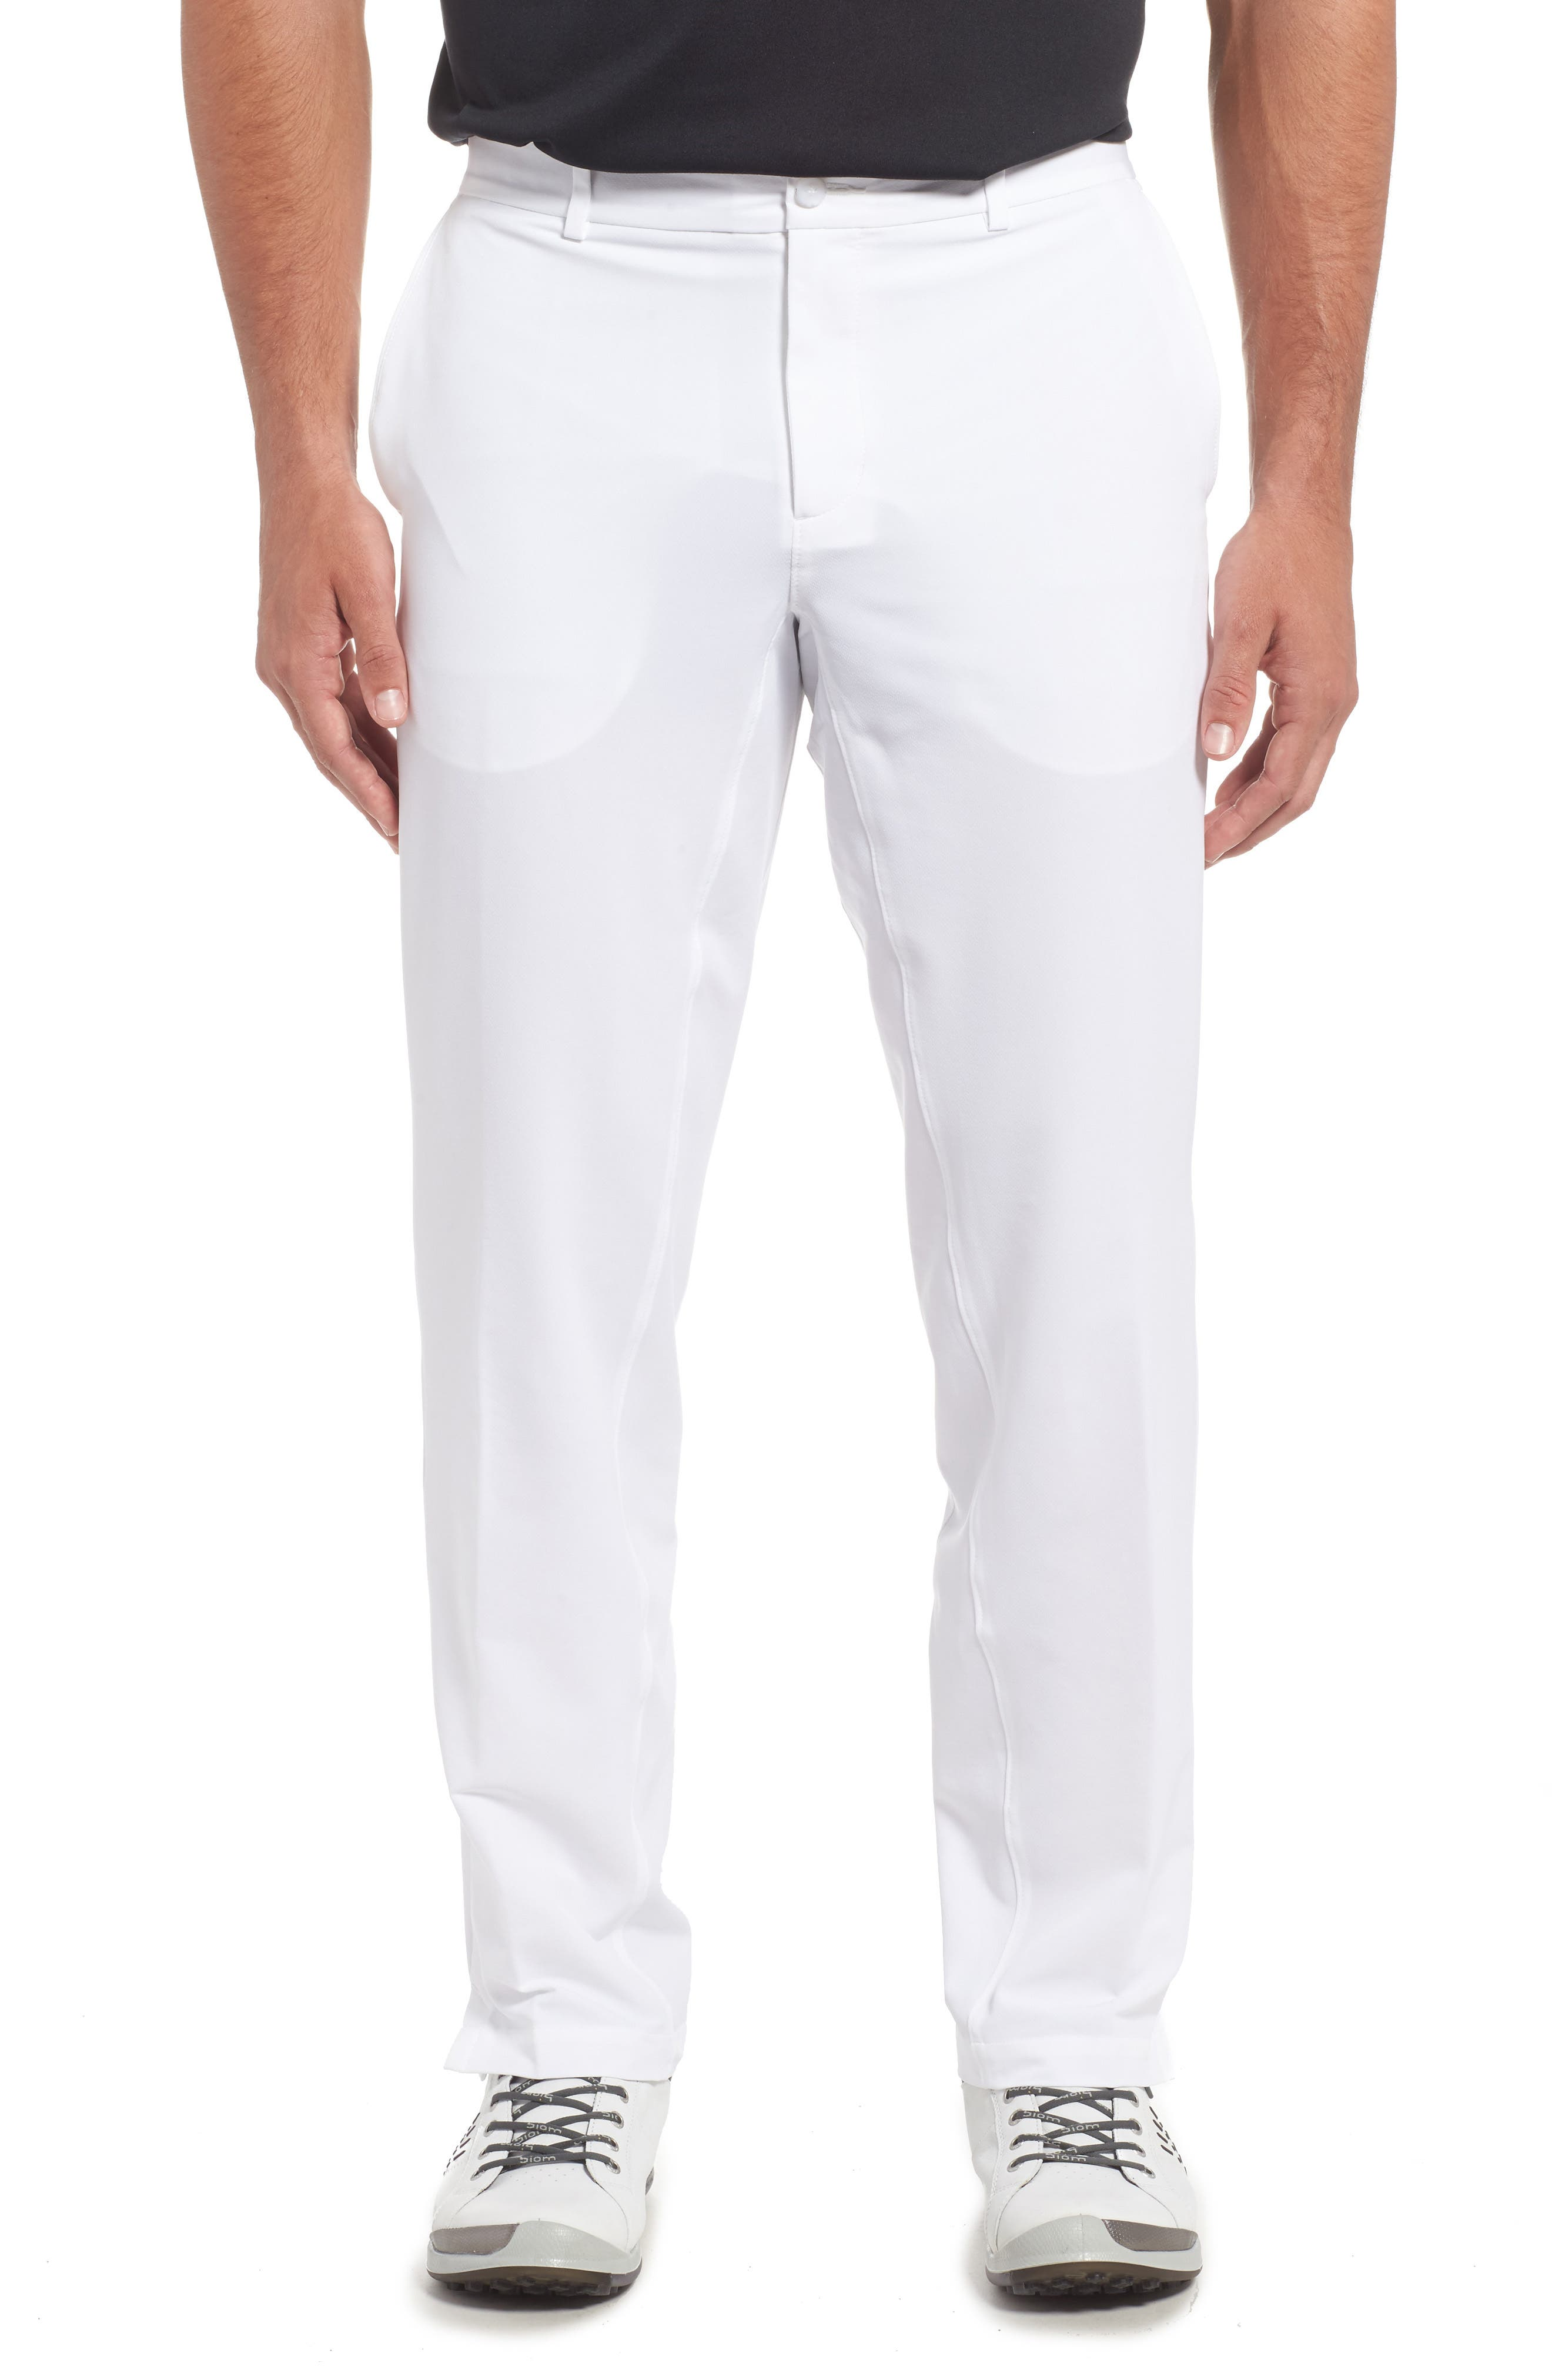 Hybrid Flex Golf Pants,                         Main,                         color, White/ Wolf Grey